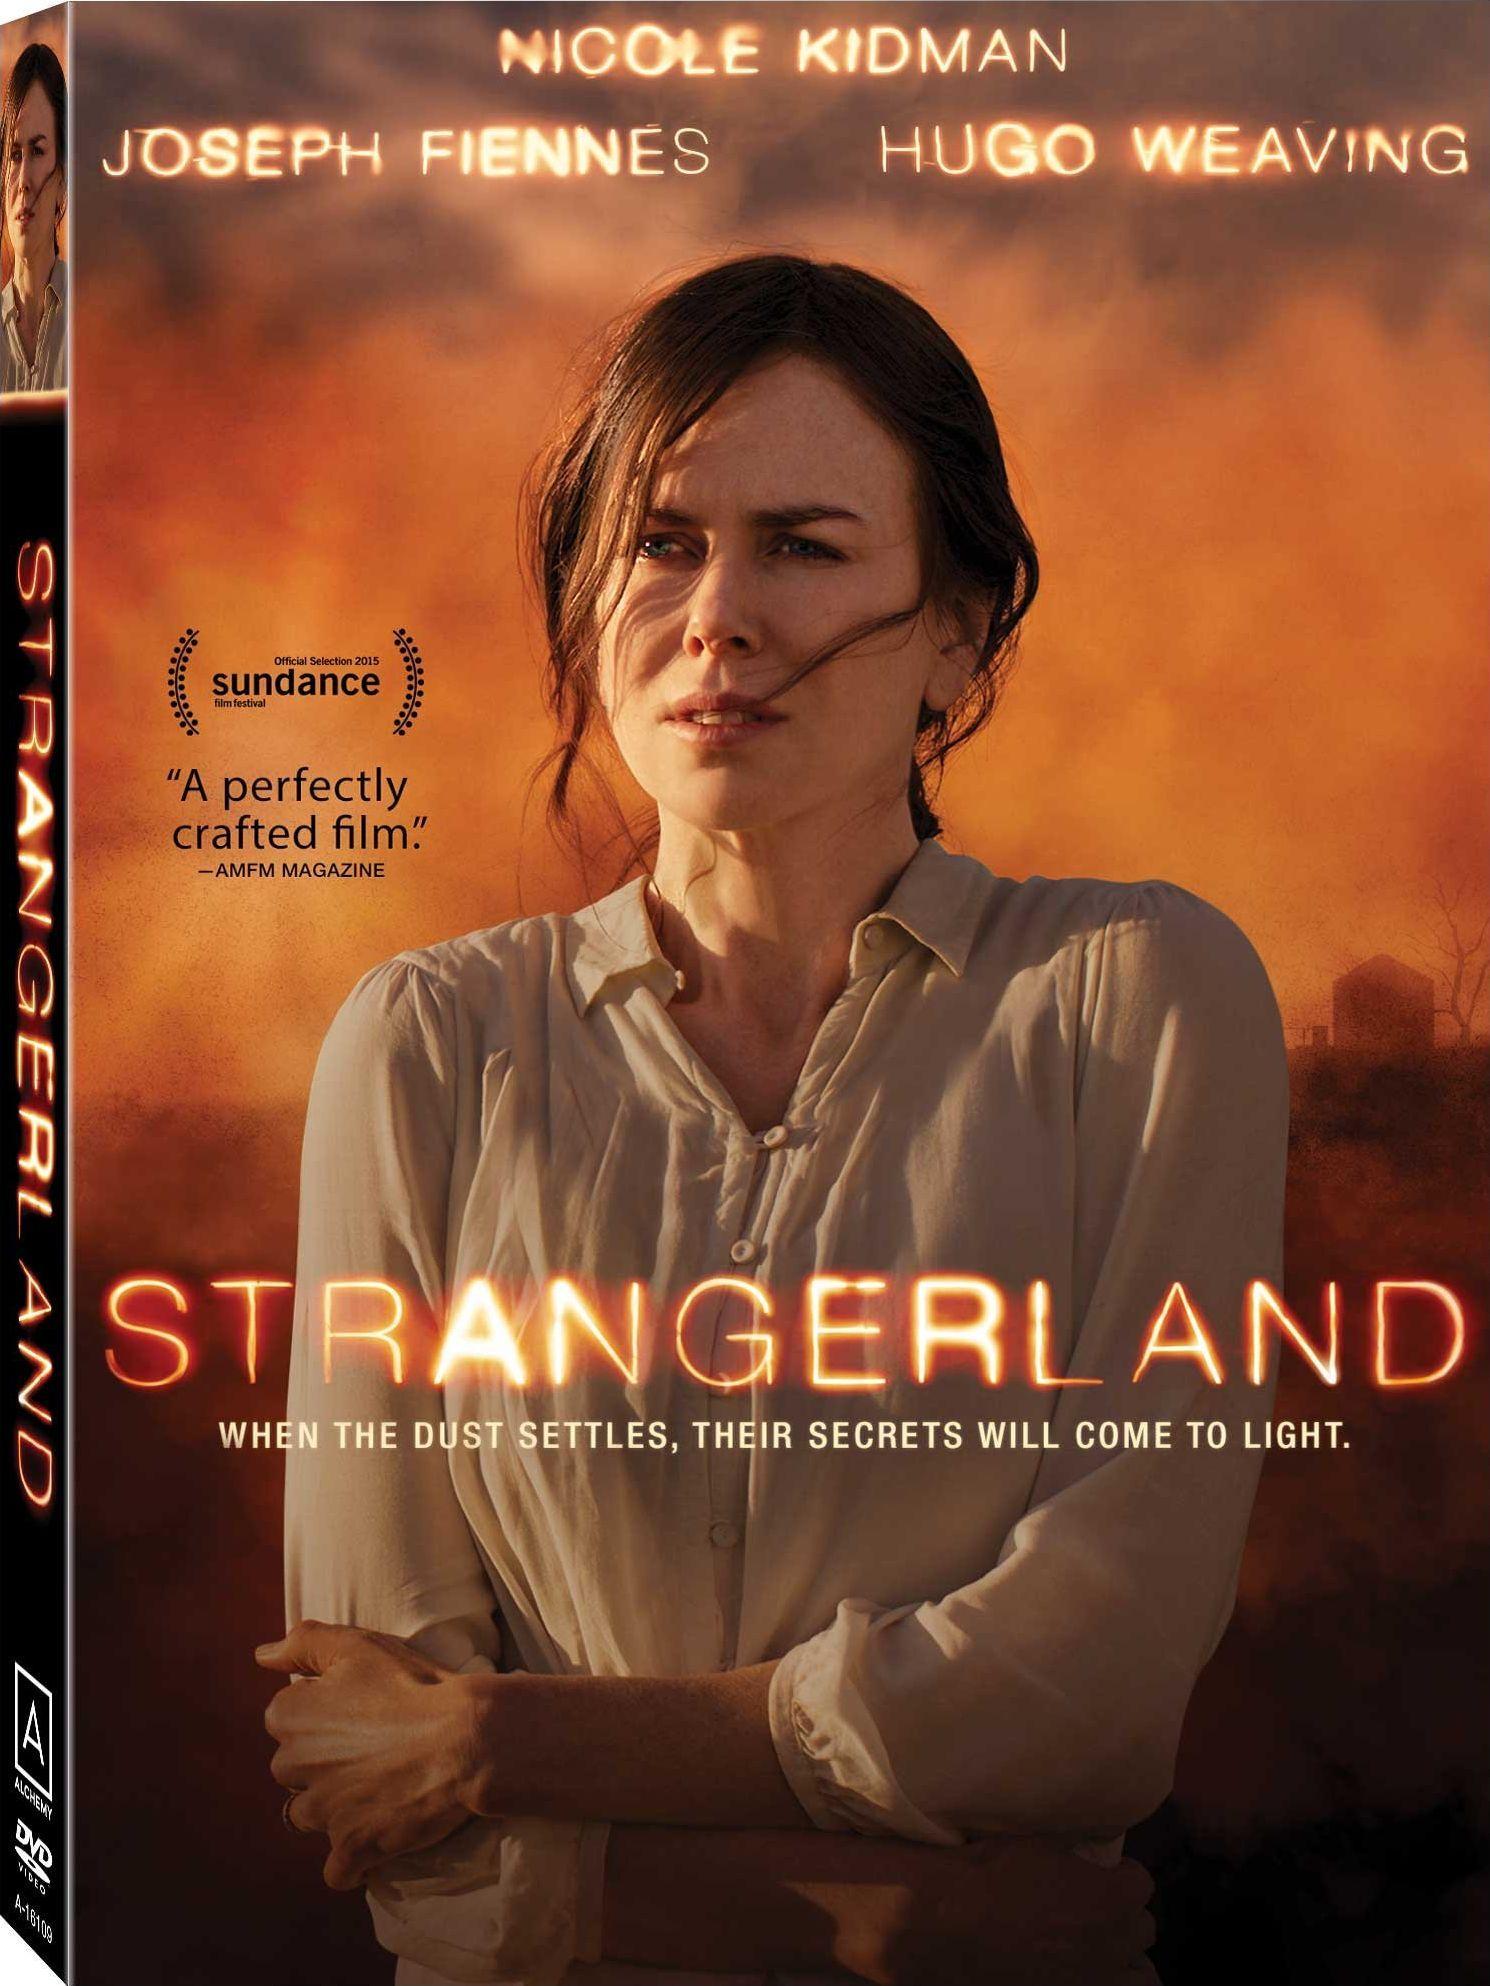 http://www.imdb.com/title/tt2325977/ It is a strange film indeed. A ...